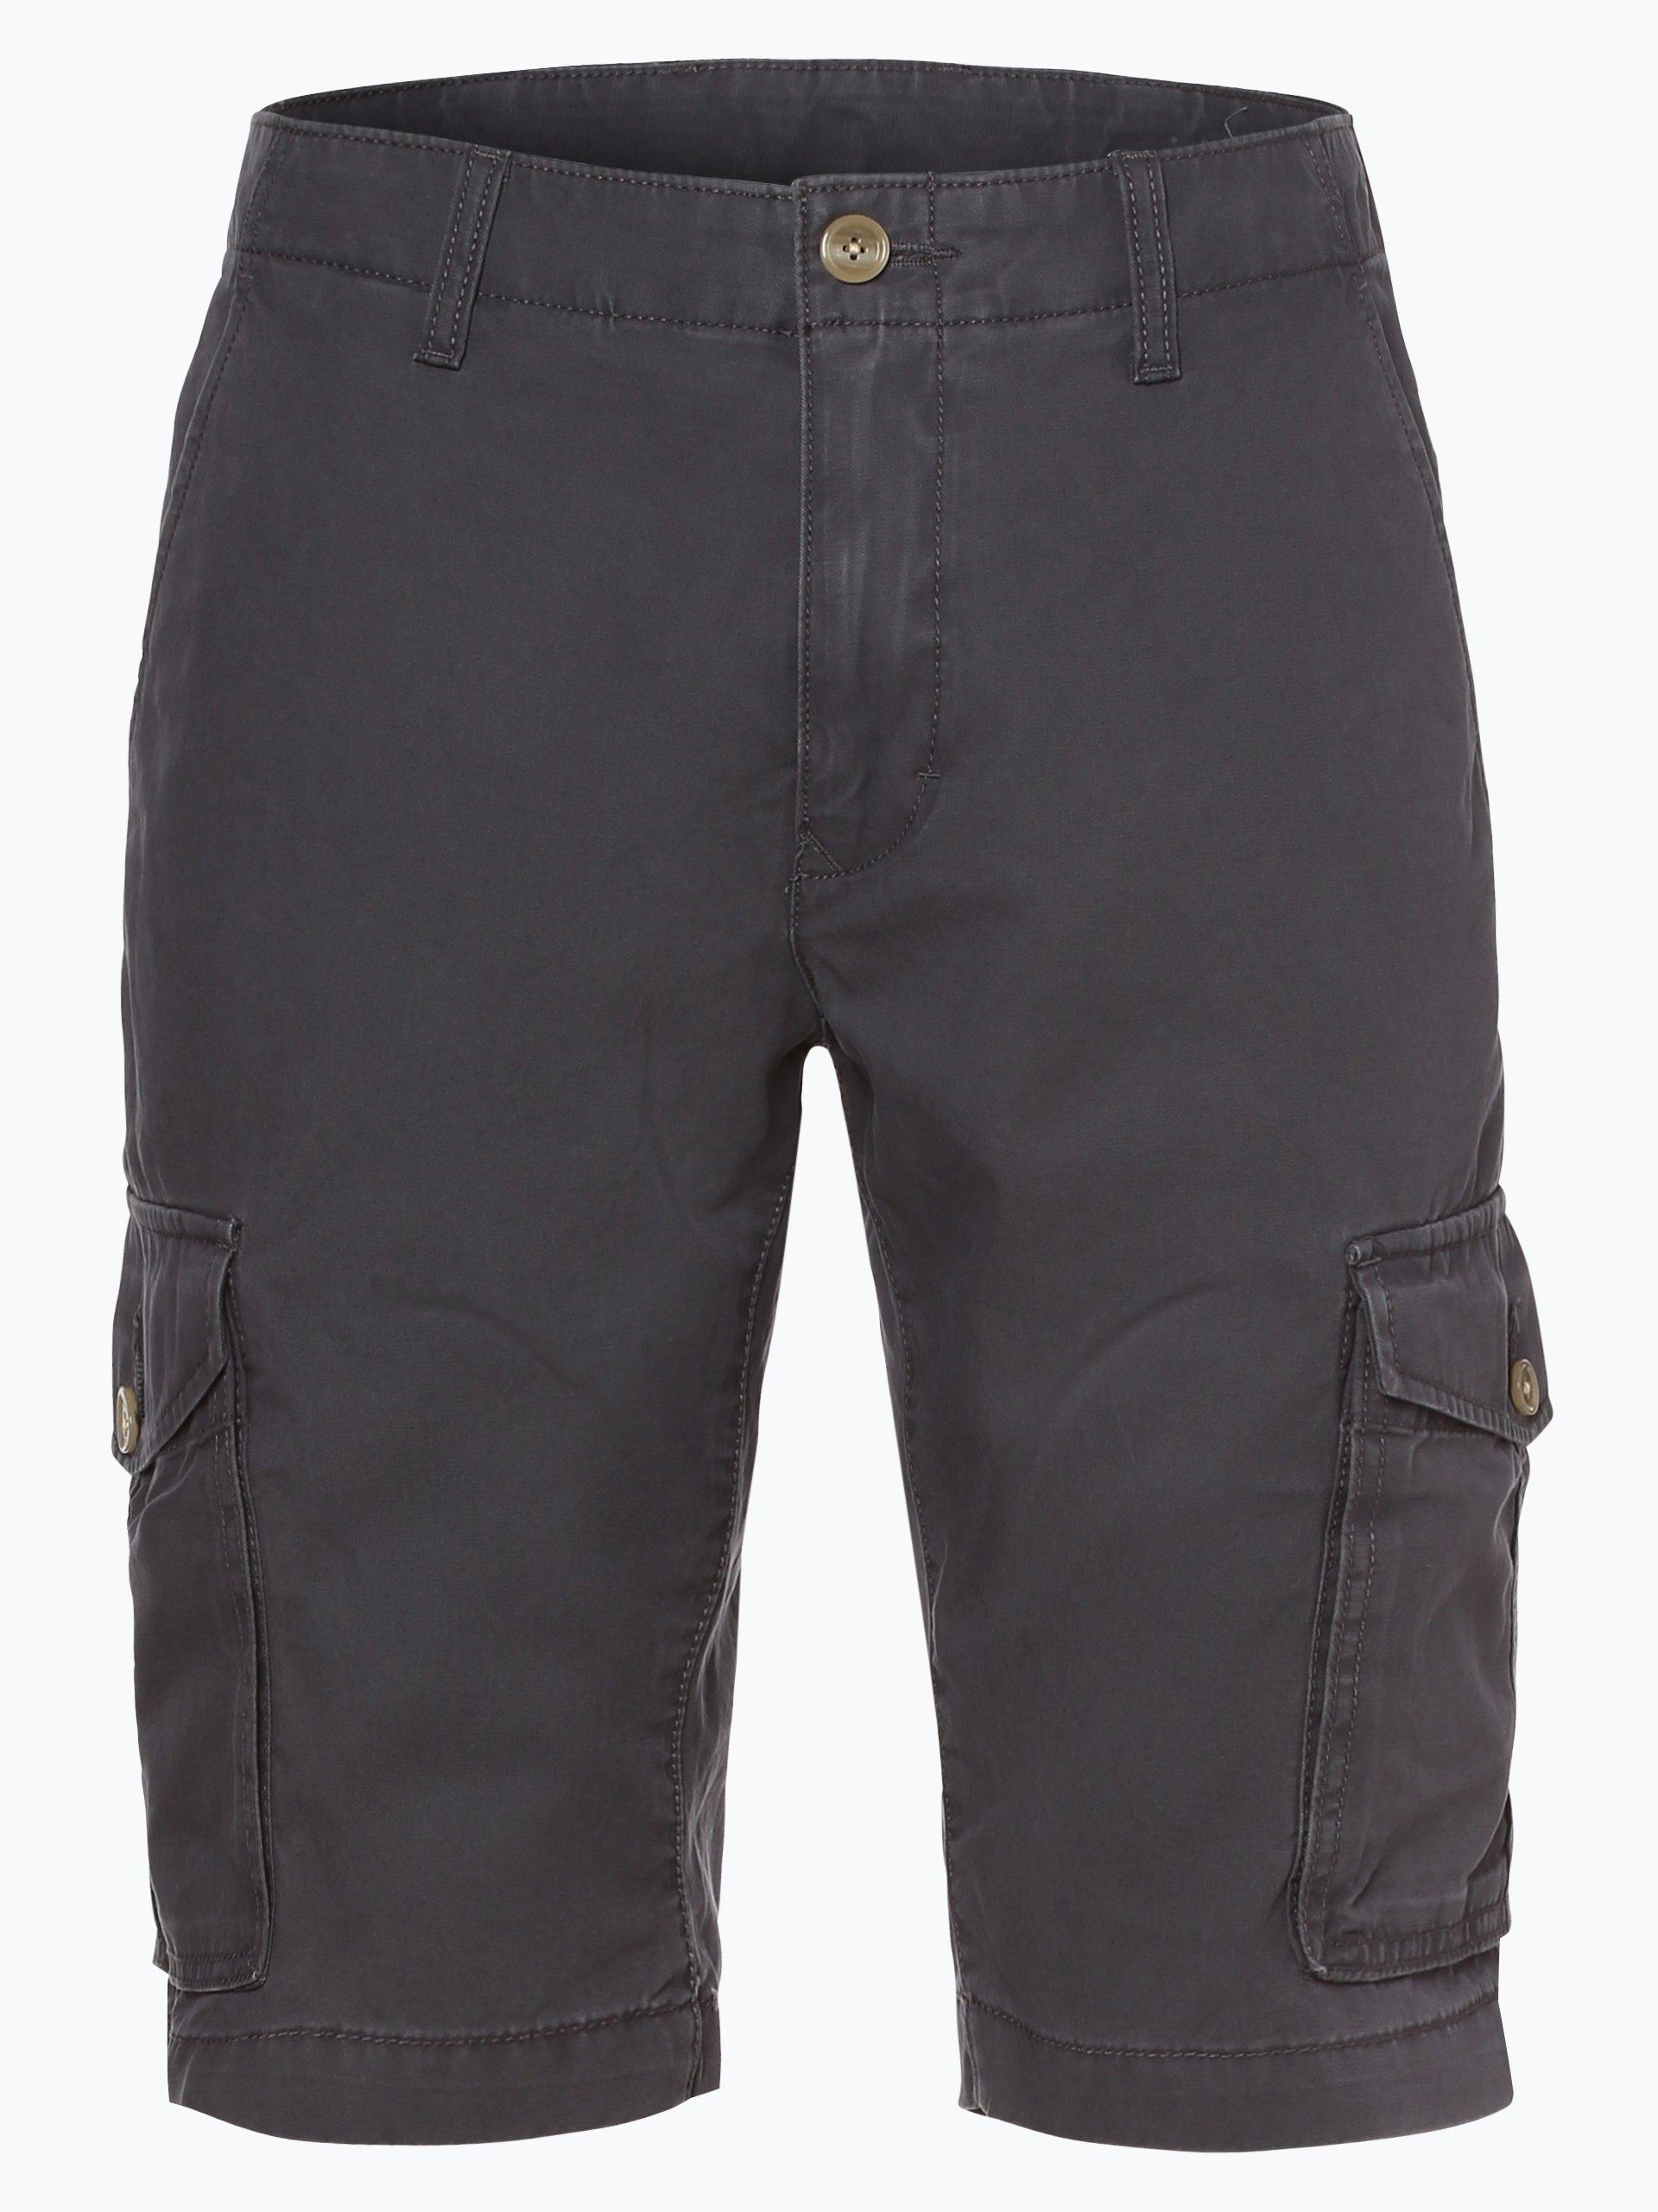 tommy hilfiger herren shorts grau uni online kaufen peek. Black Bedroom Furniture Sets. Home Design Ideas